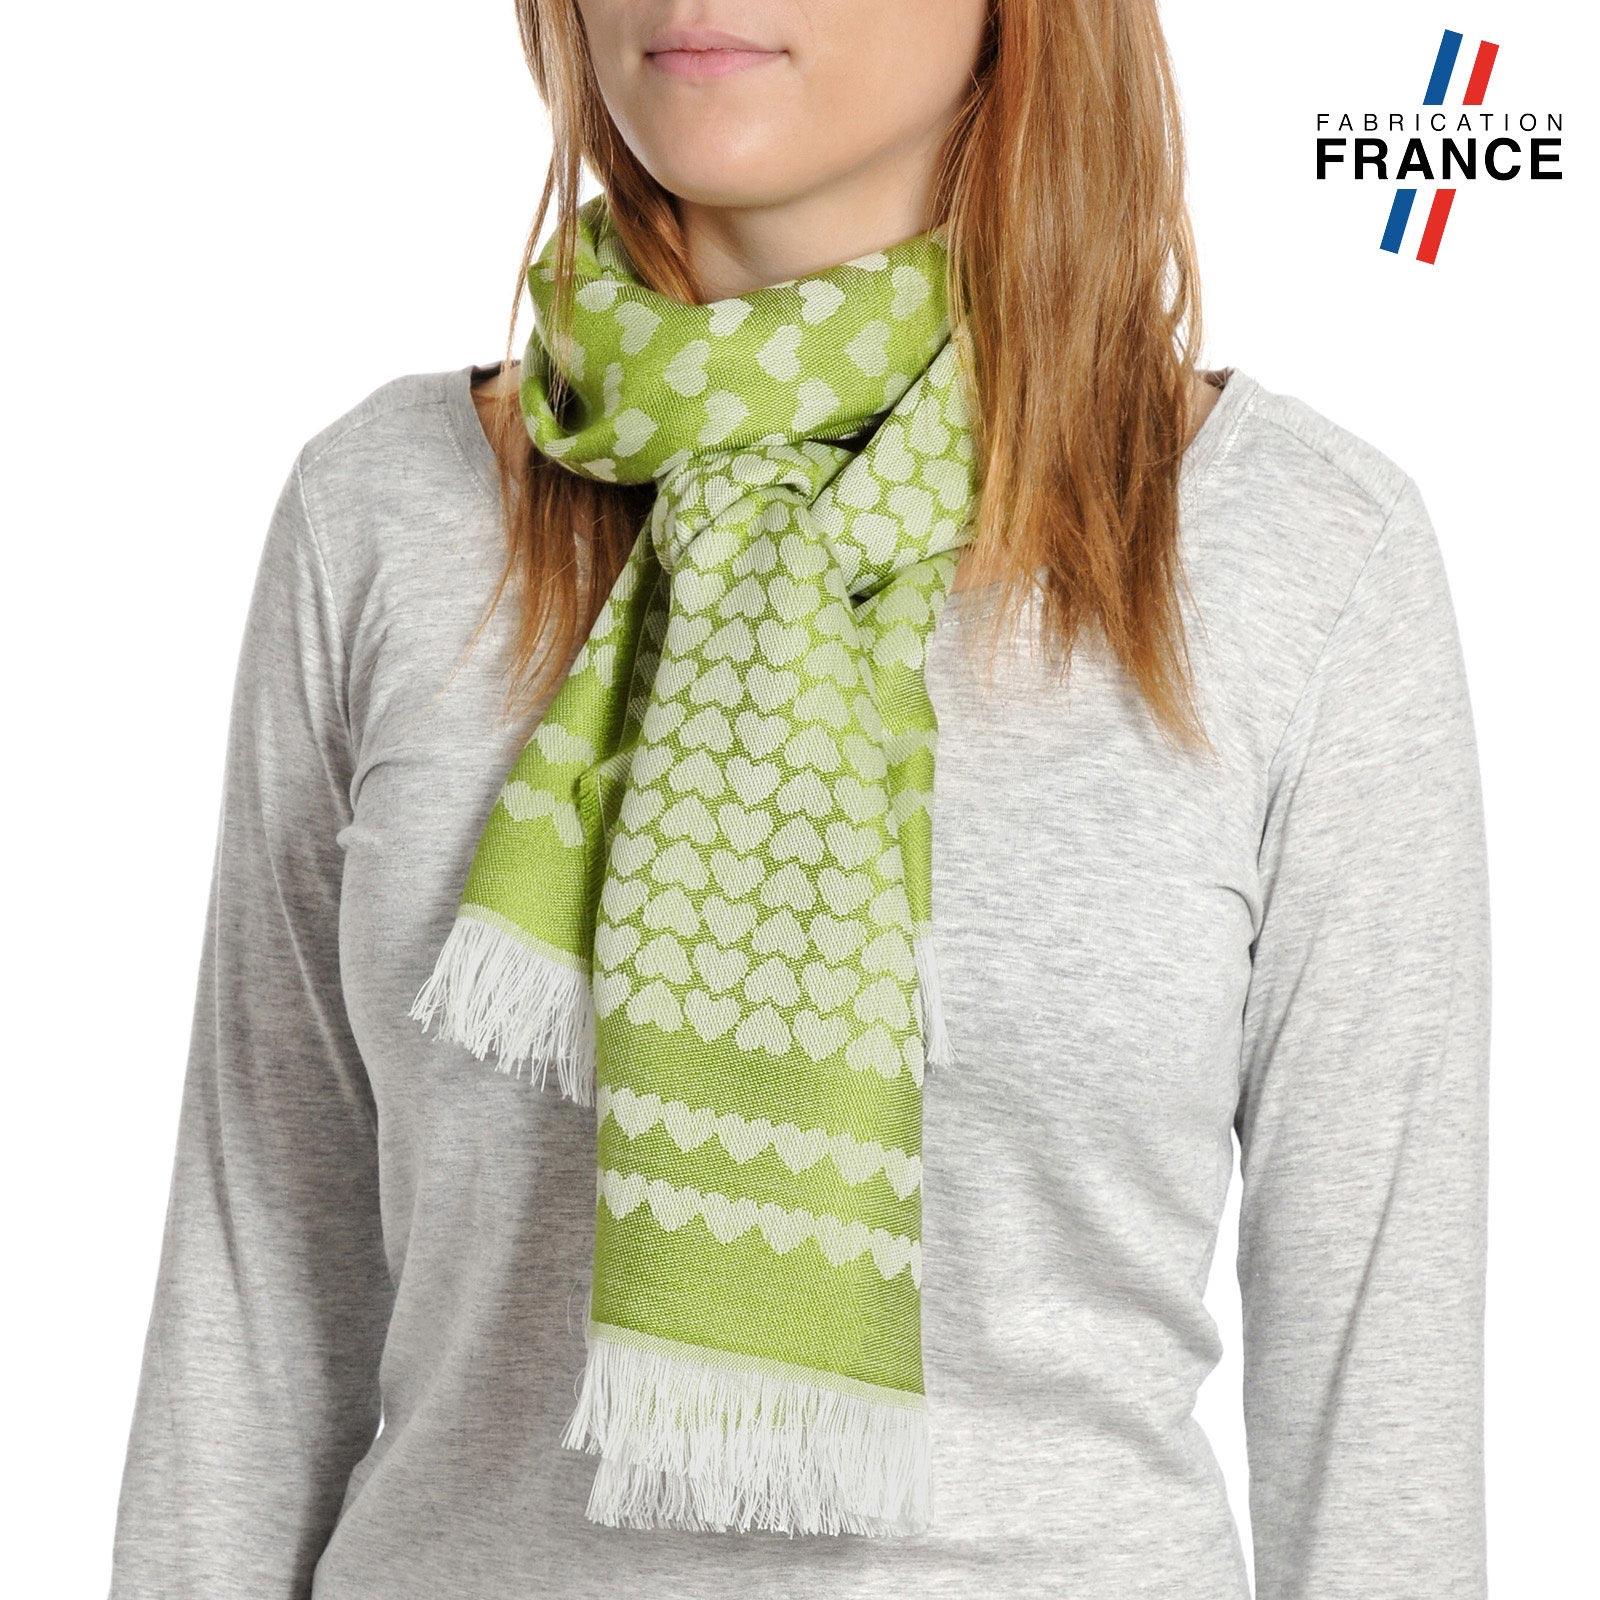 AT-04275-VF10-T-LB_FR-echarpe-qualicoq-motifs-coeurs-vert